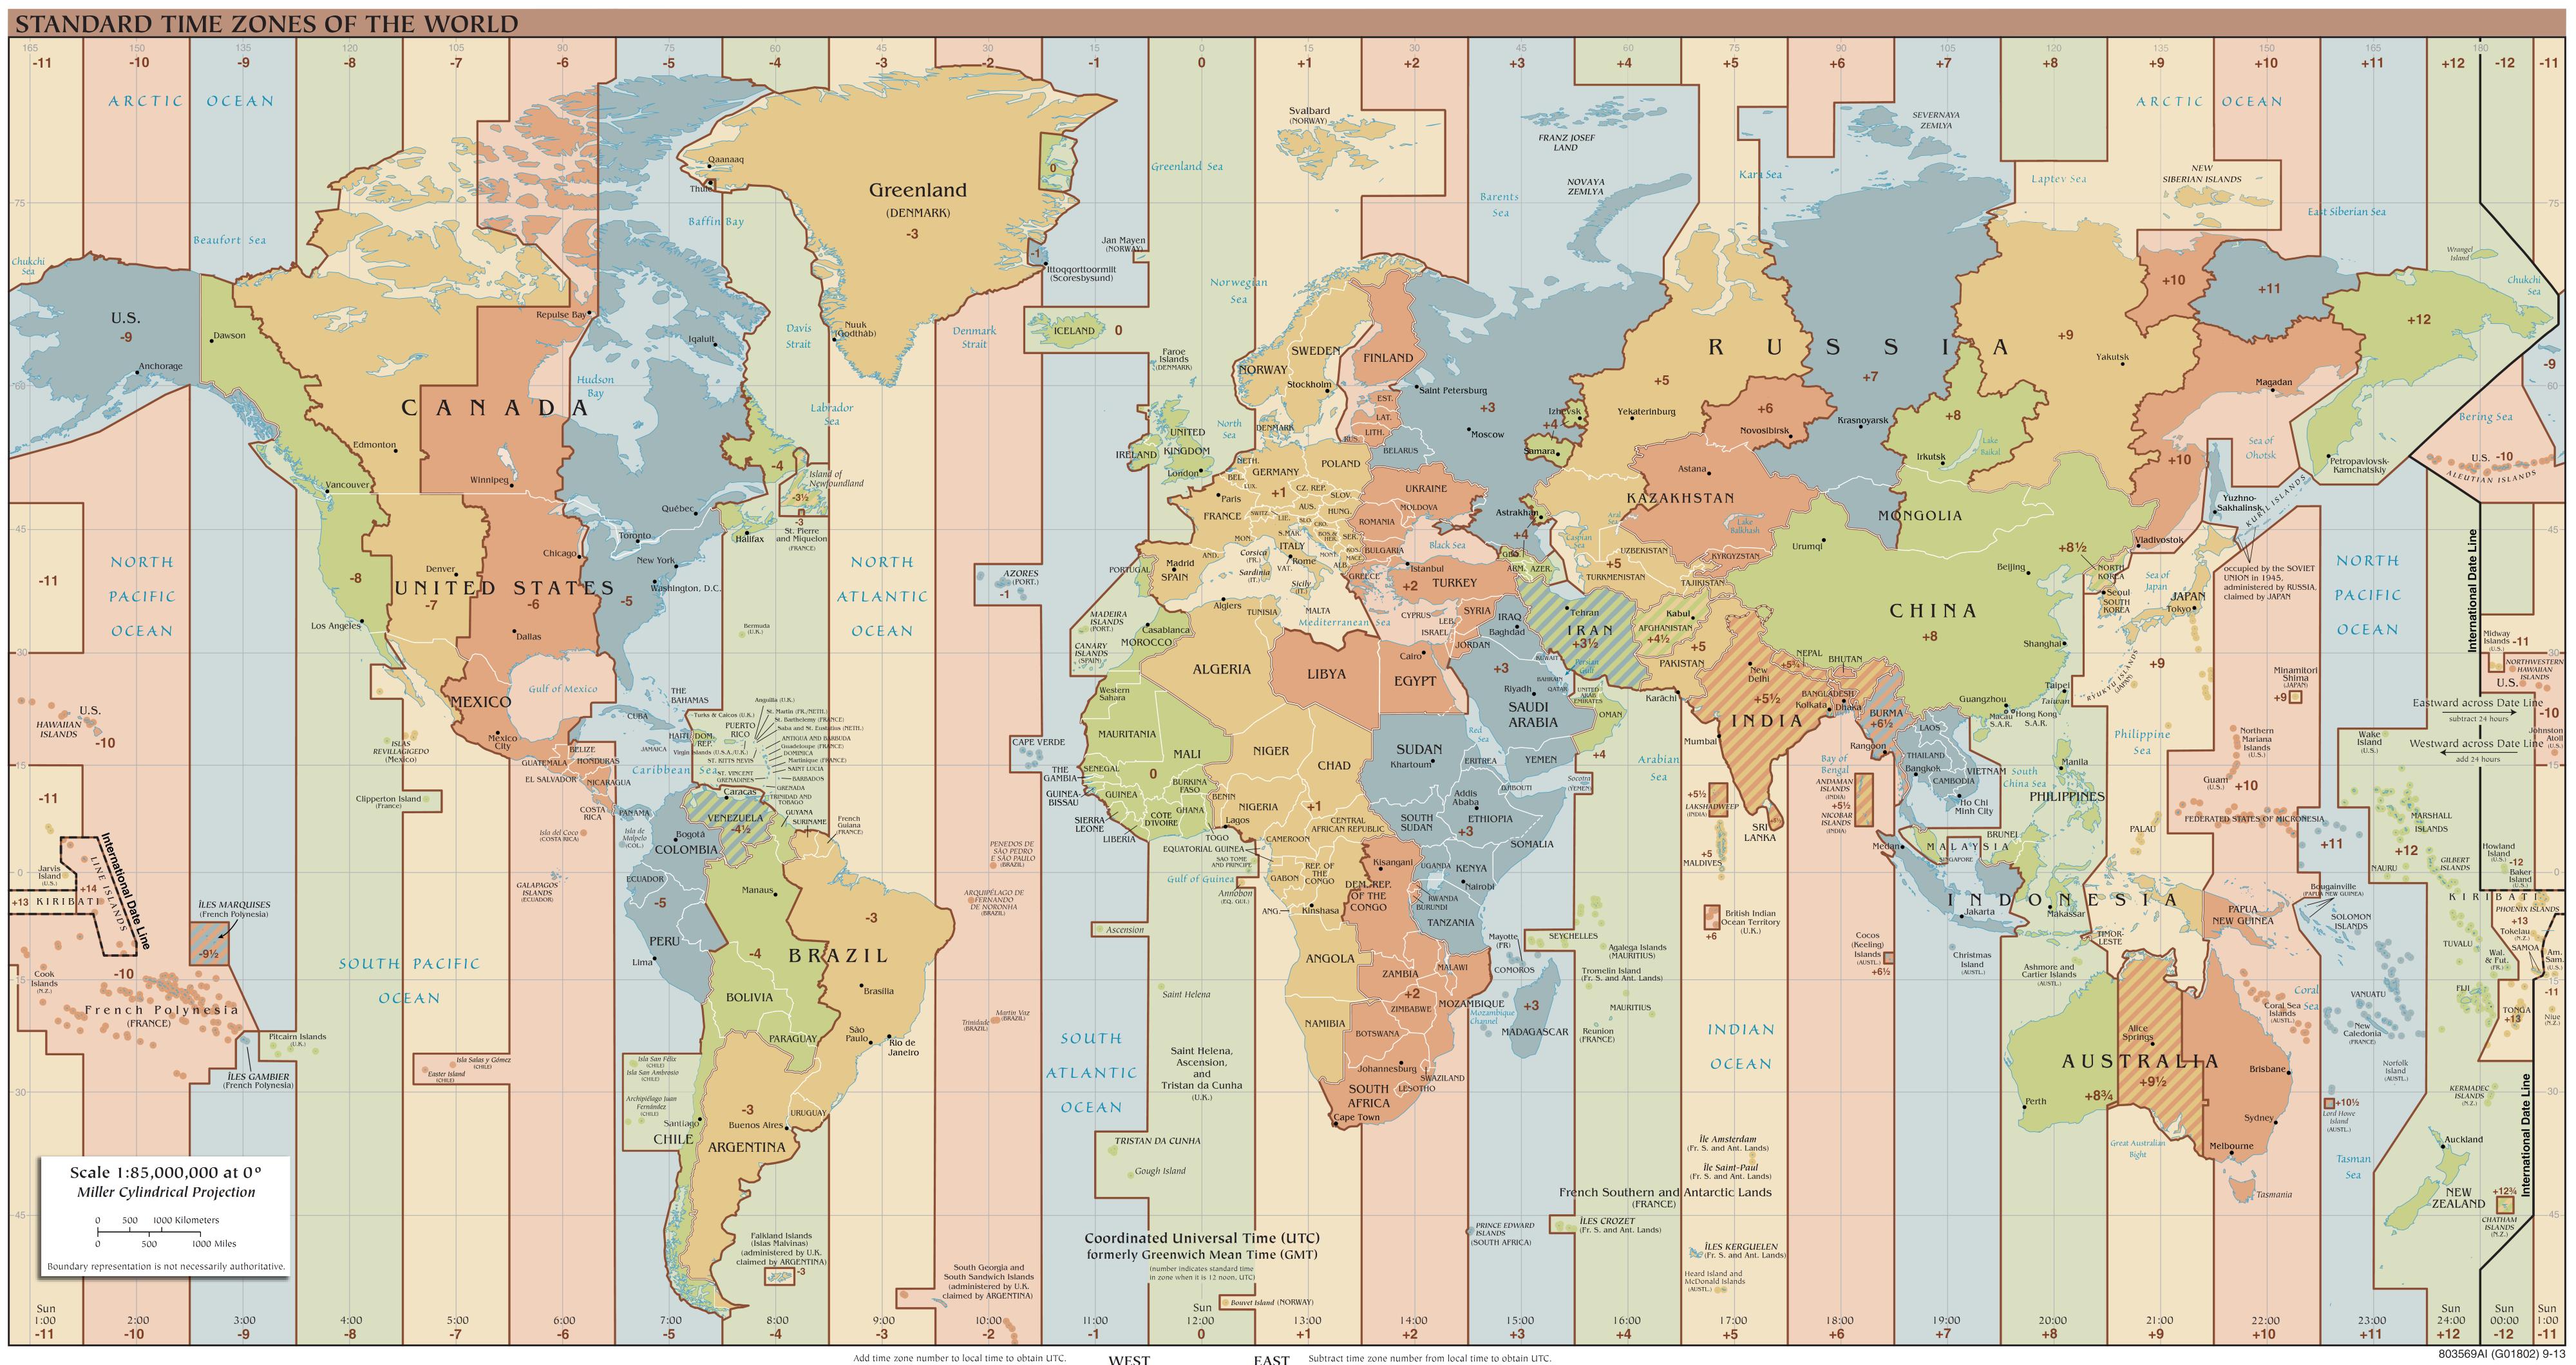 Tijdzones wereldg 40002120 pav interessante links pinterest explore world time zones time zone map and more gumiabroncs Gallery